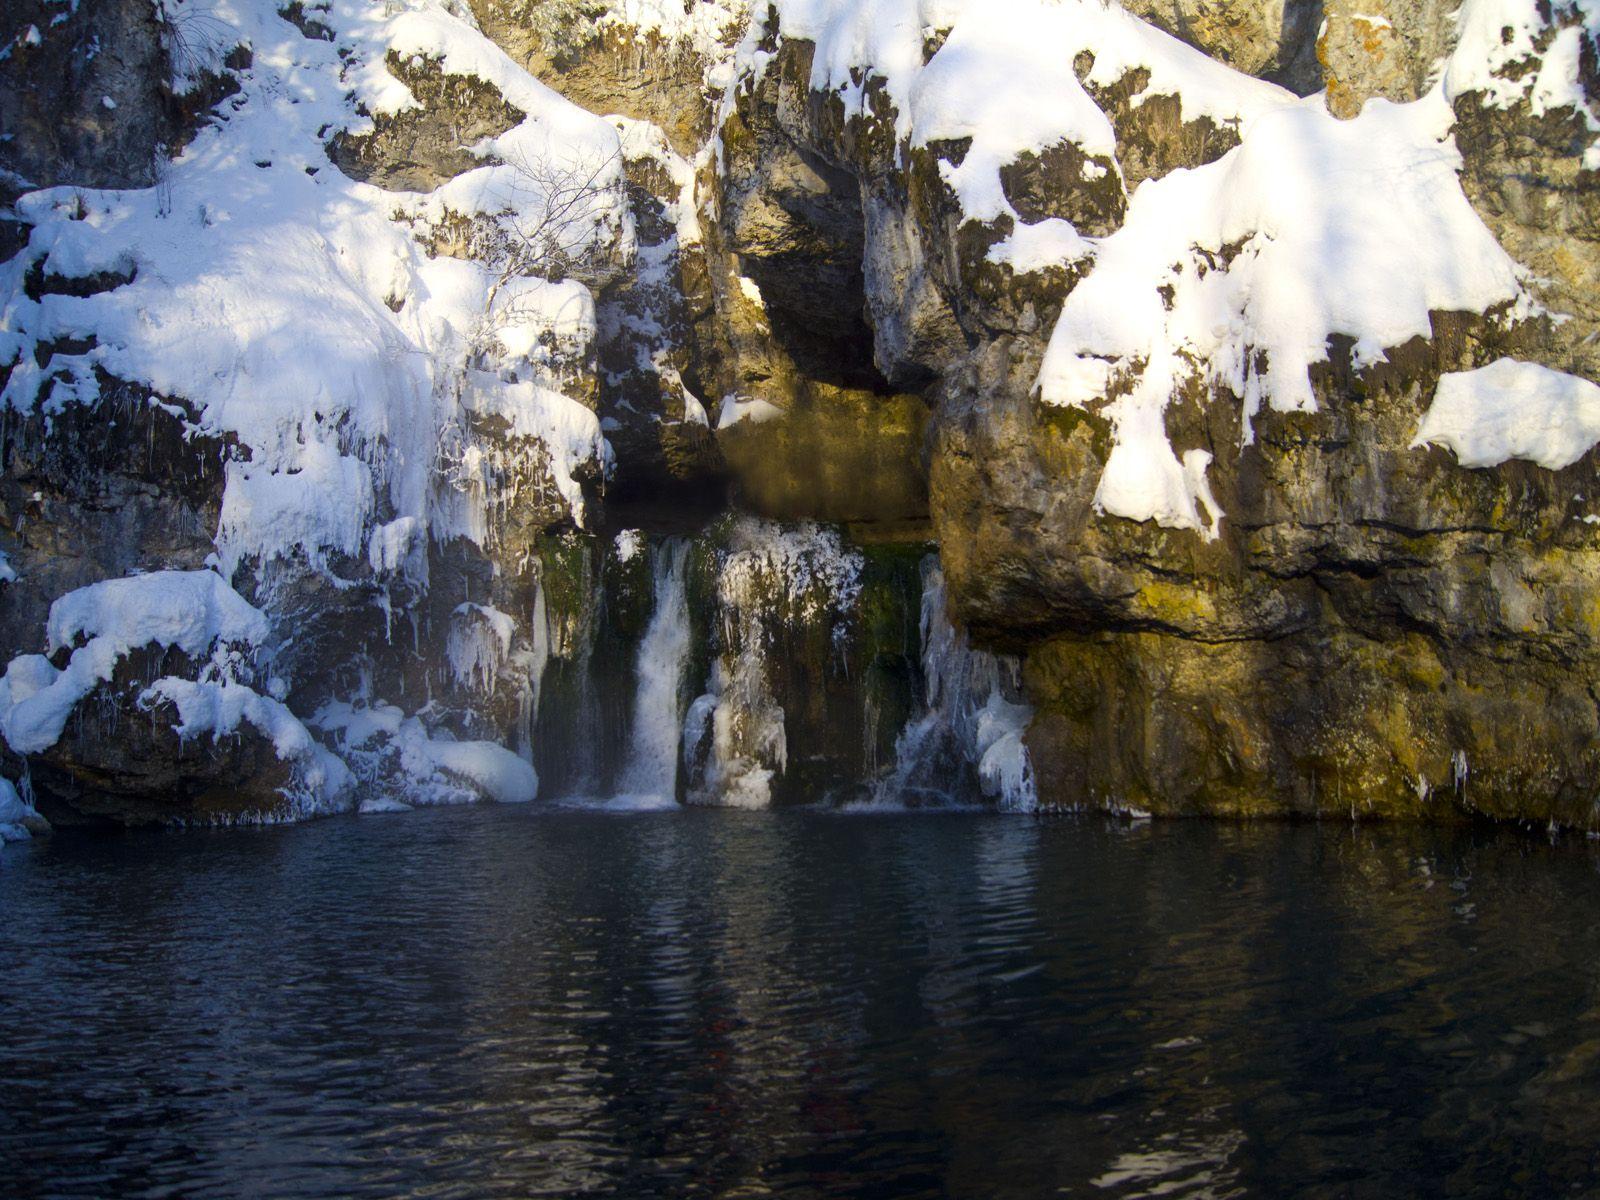 Водопад Атыш в снегу